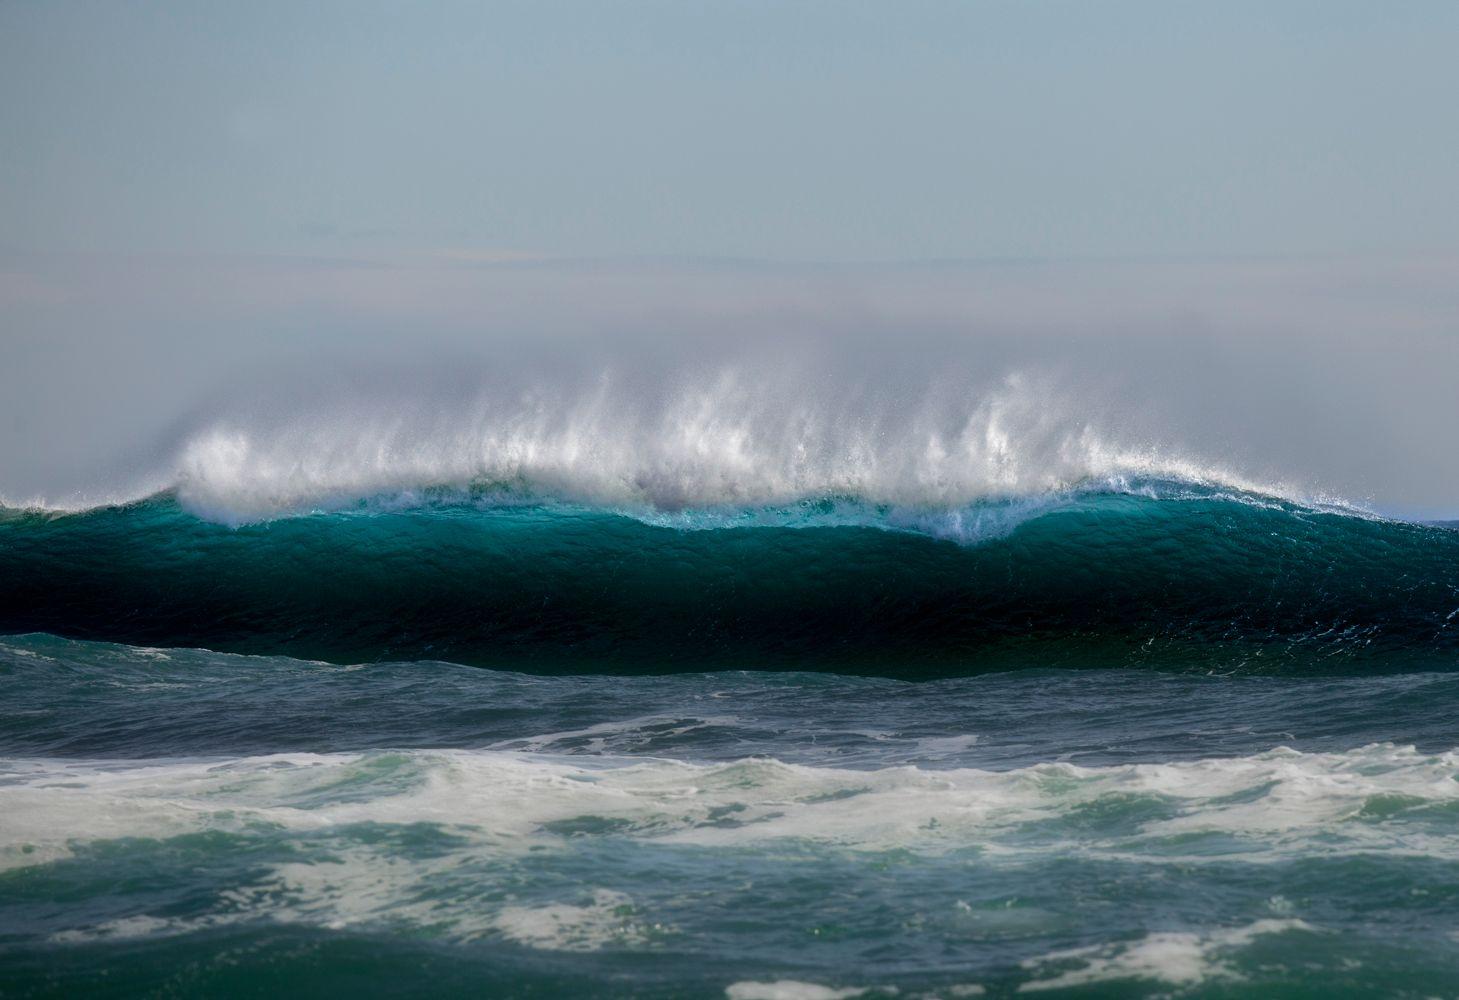 Волна камчатка океан шторм море волна волны прибой вода